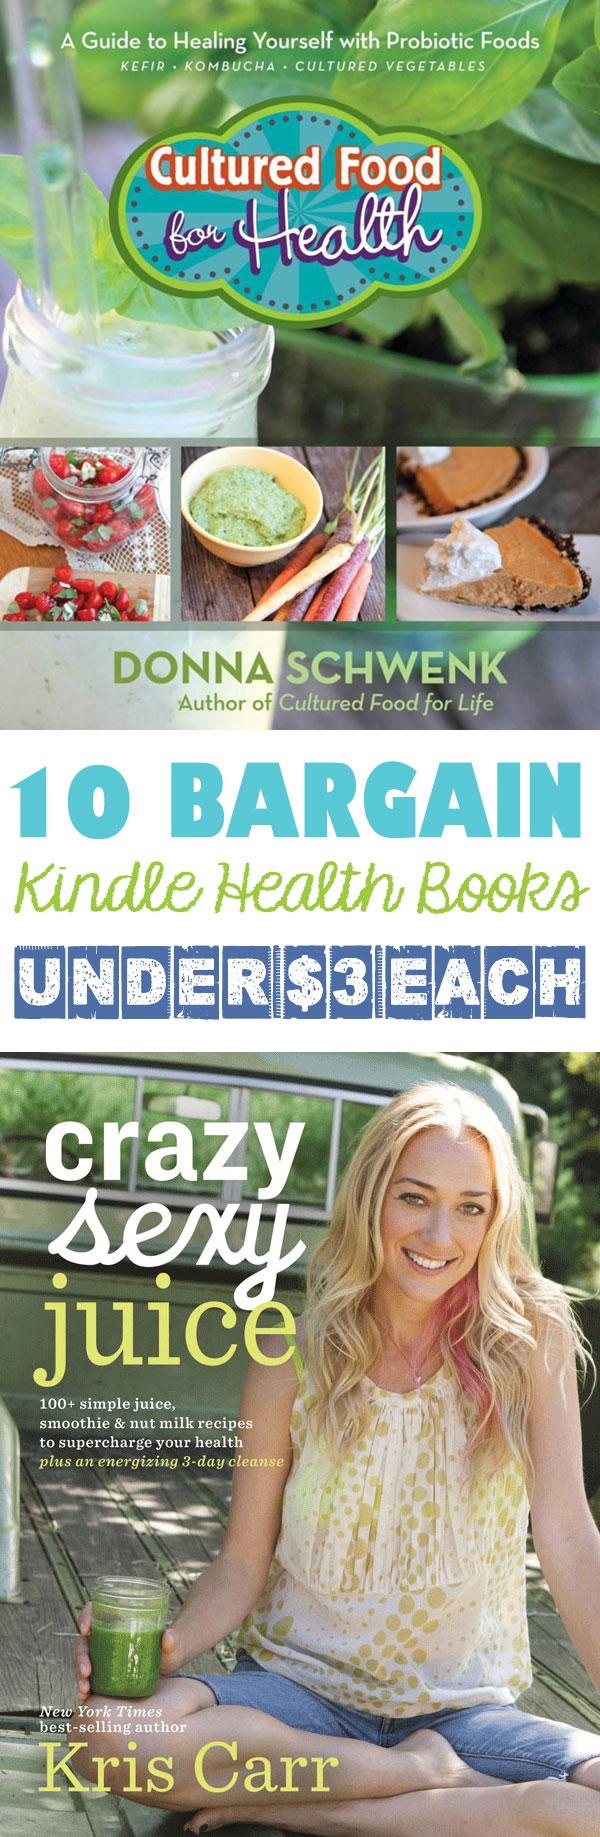 10 Kindle Health Books Under 3 Dollars Each